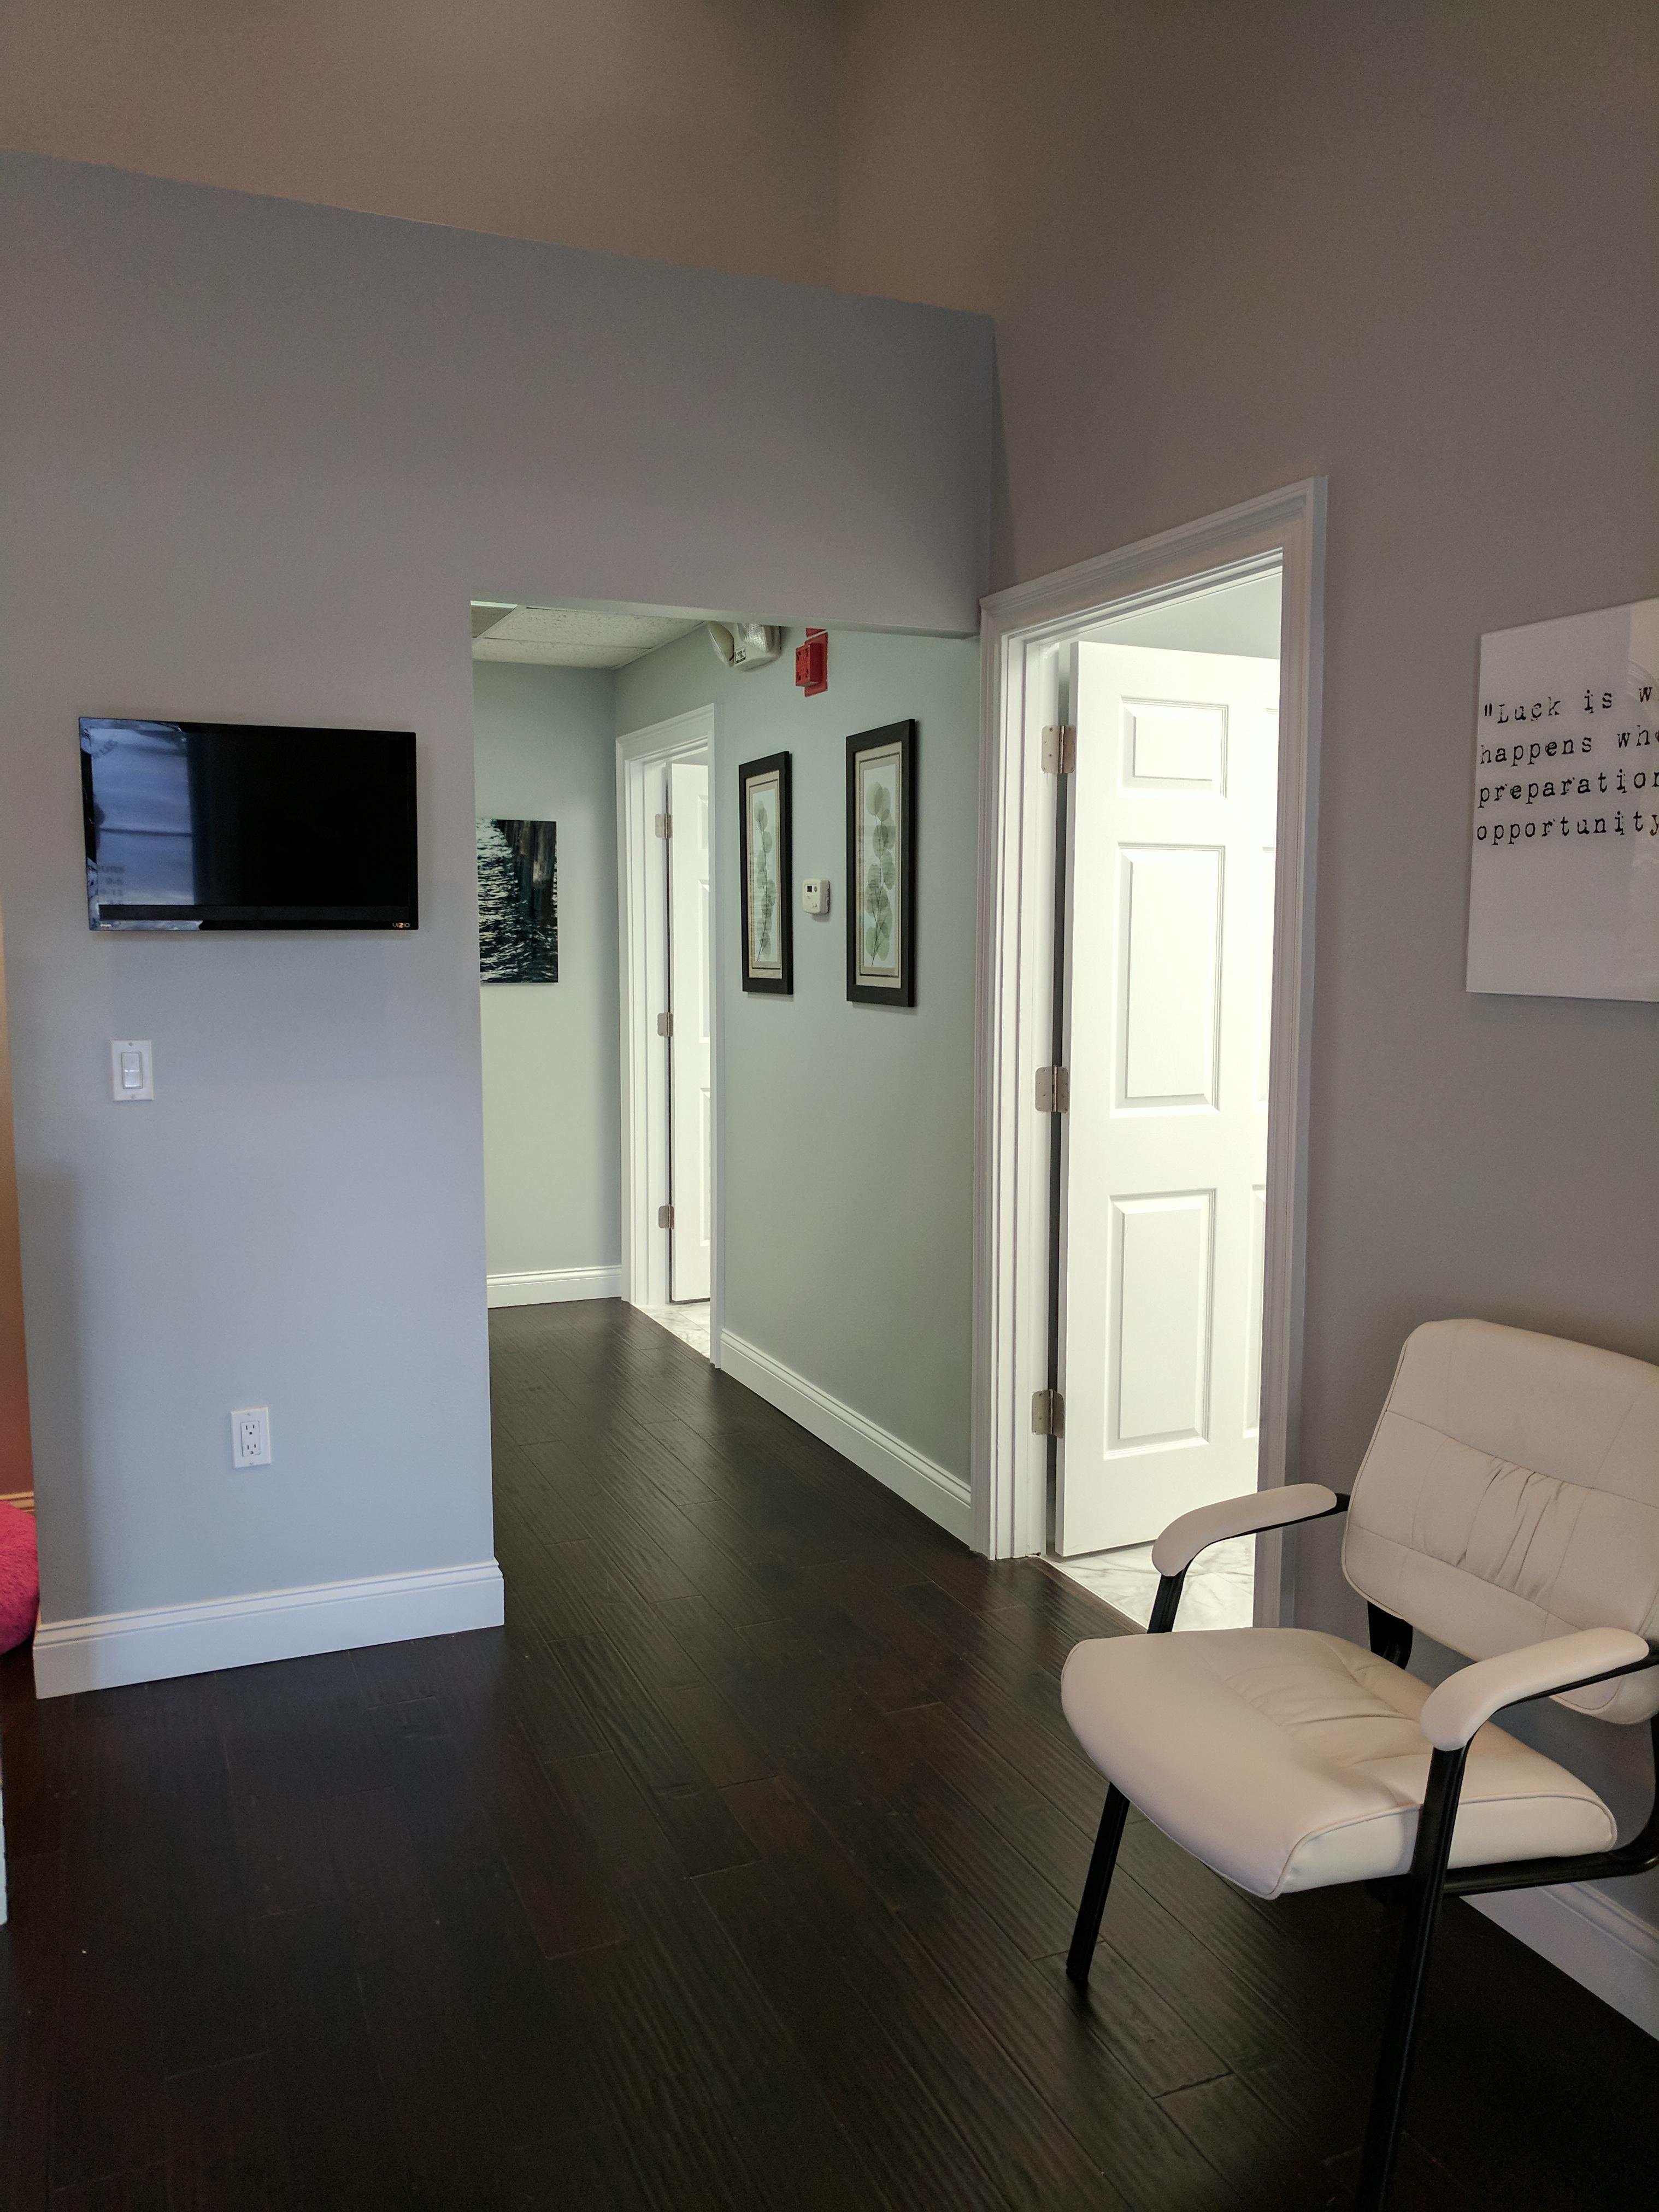 United Joint & Spine Center image 5